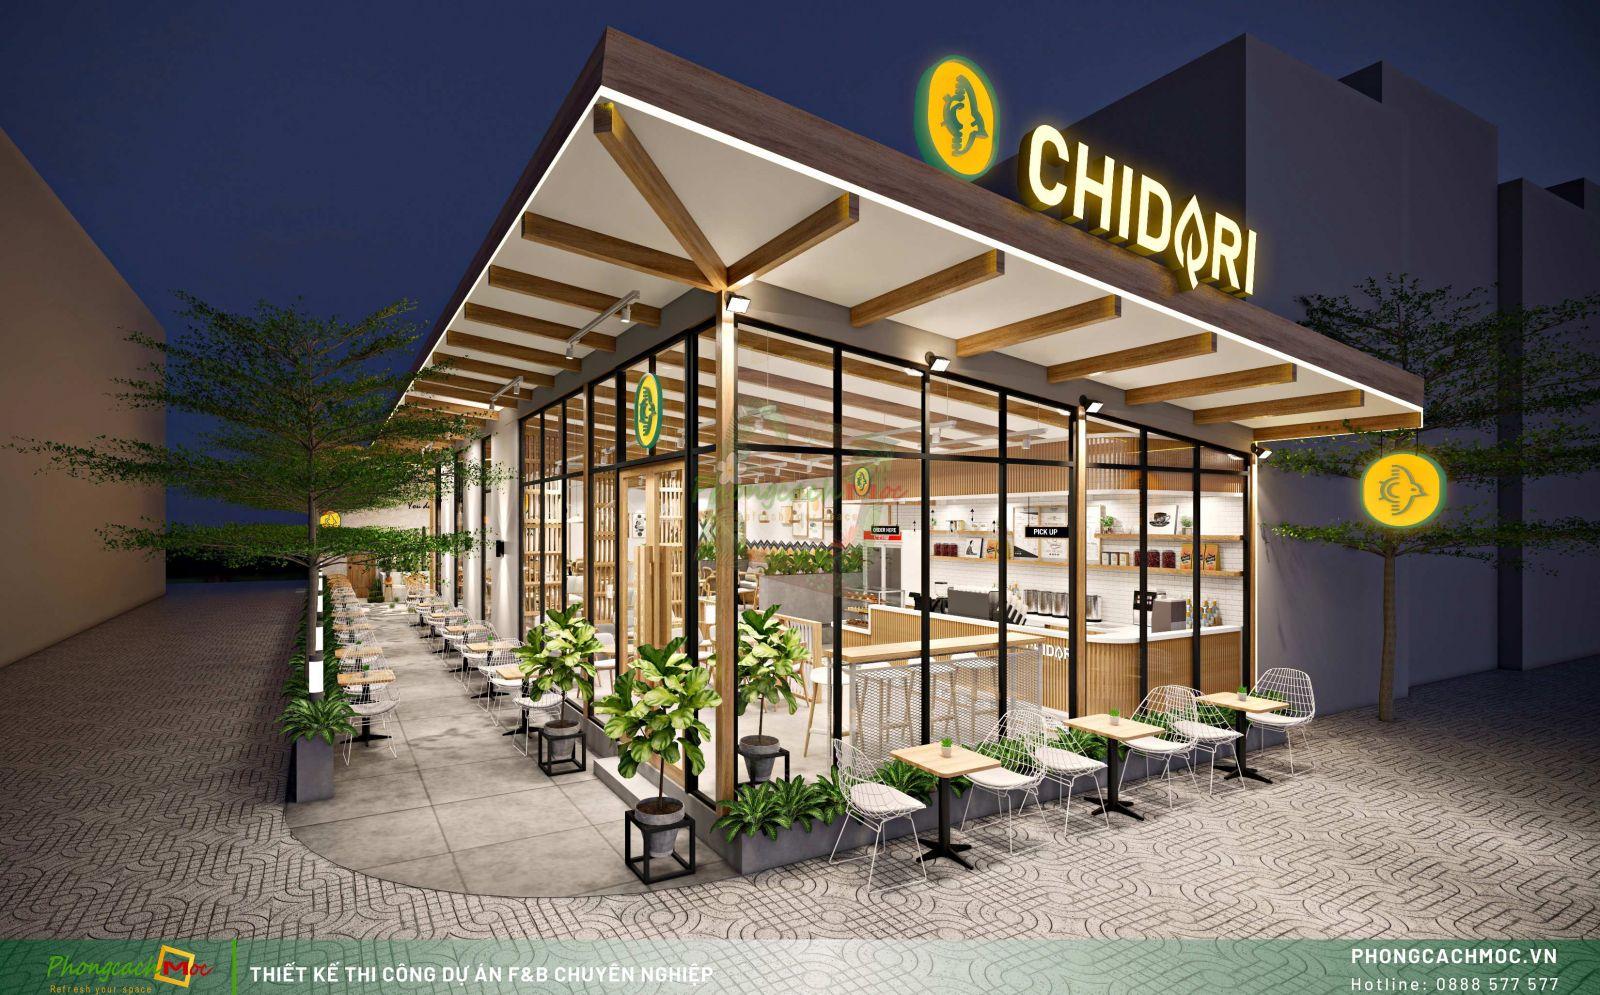 Dự án Chidori Coffee & Tea - Rạch Giá